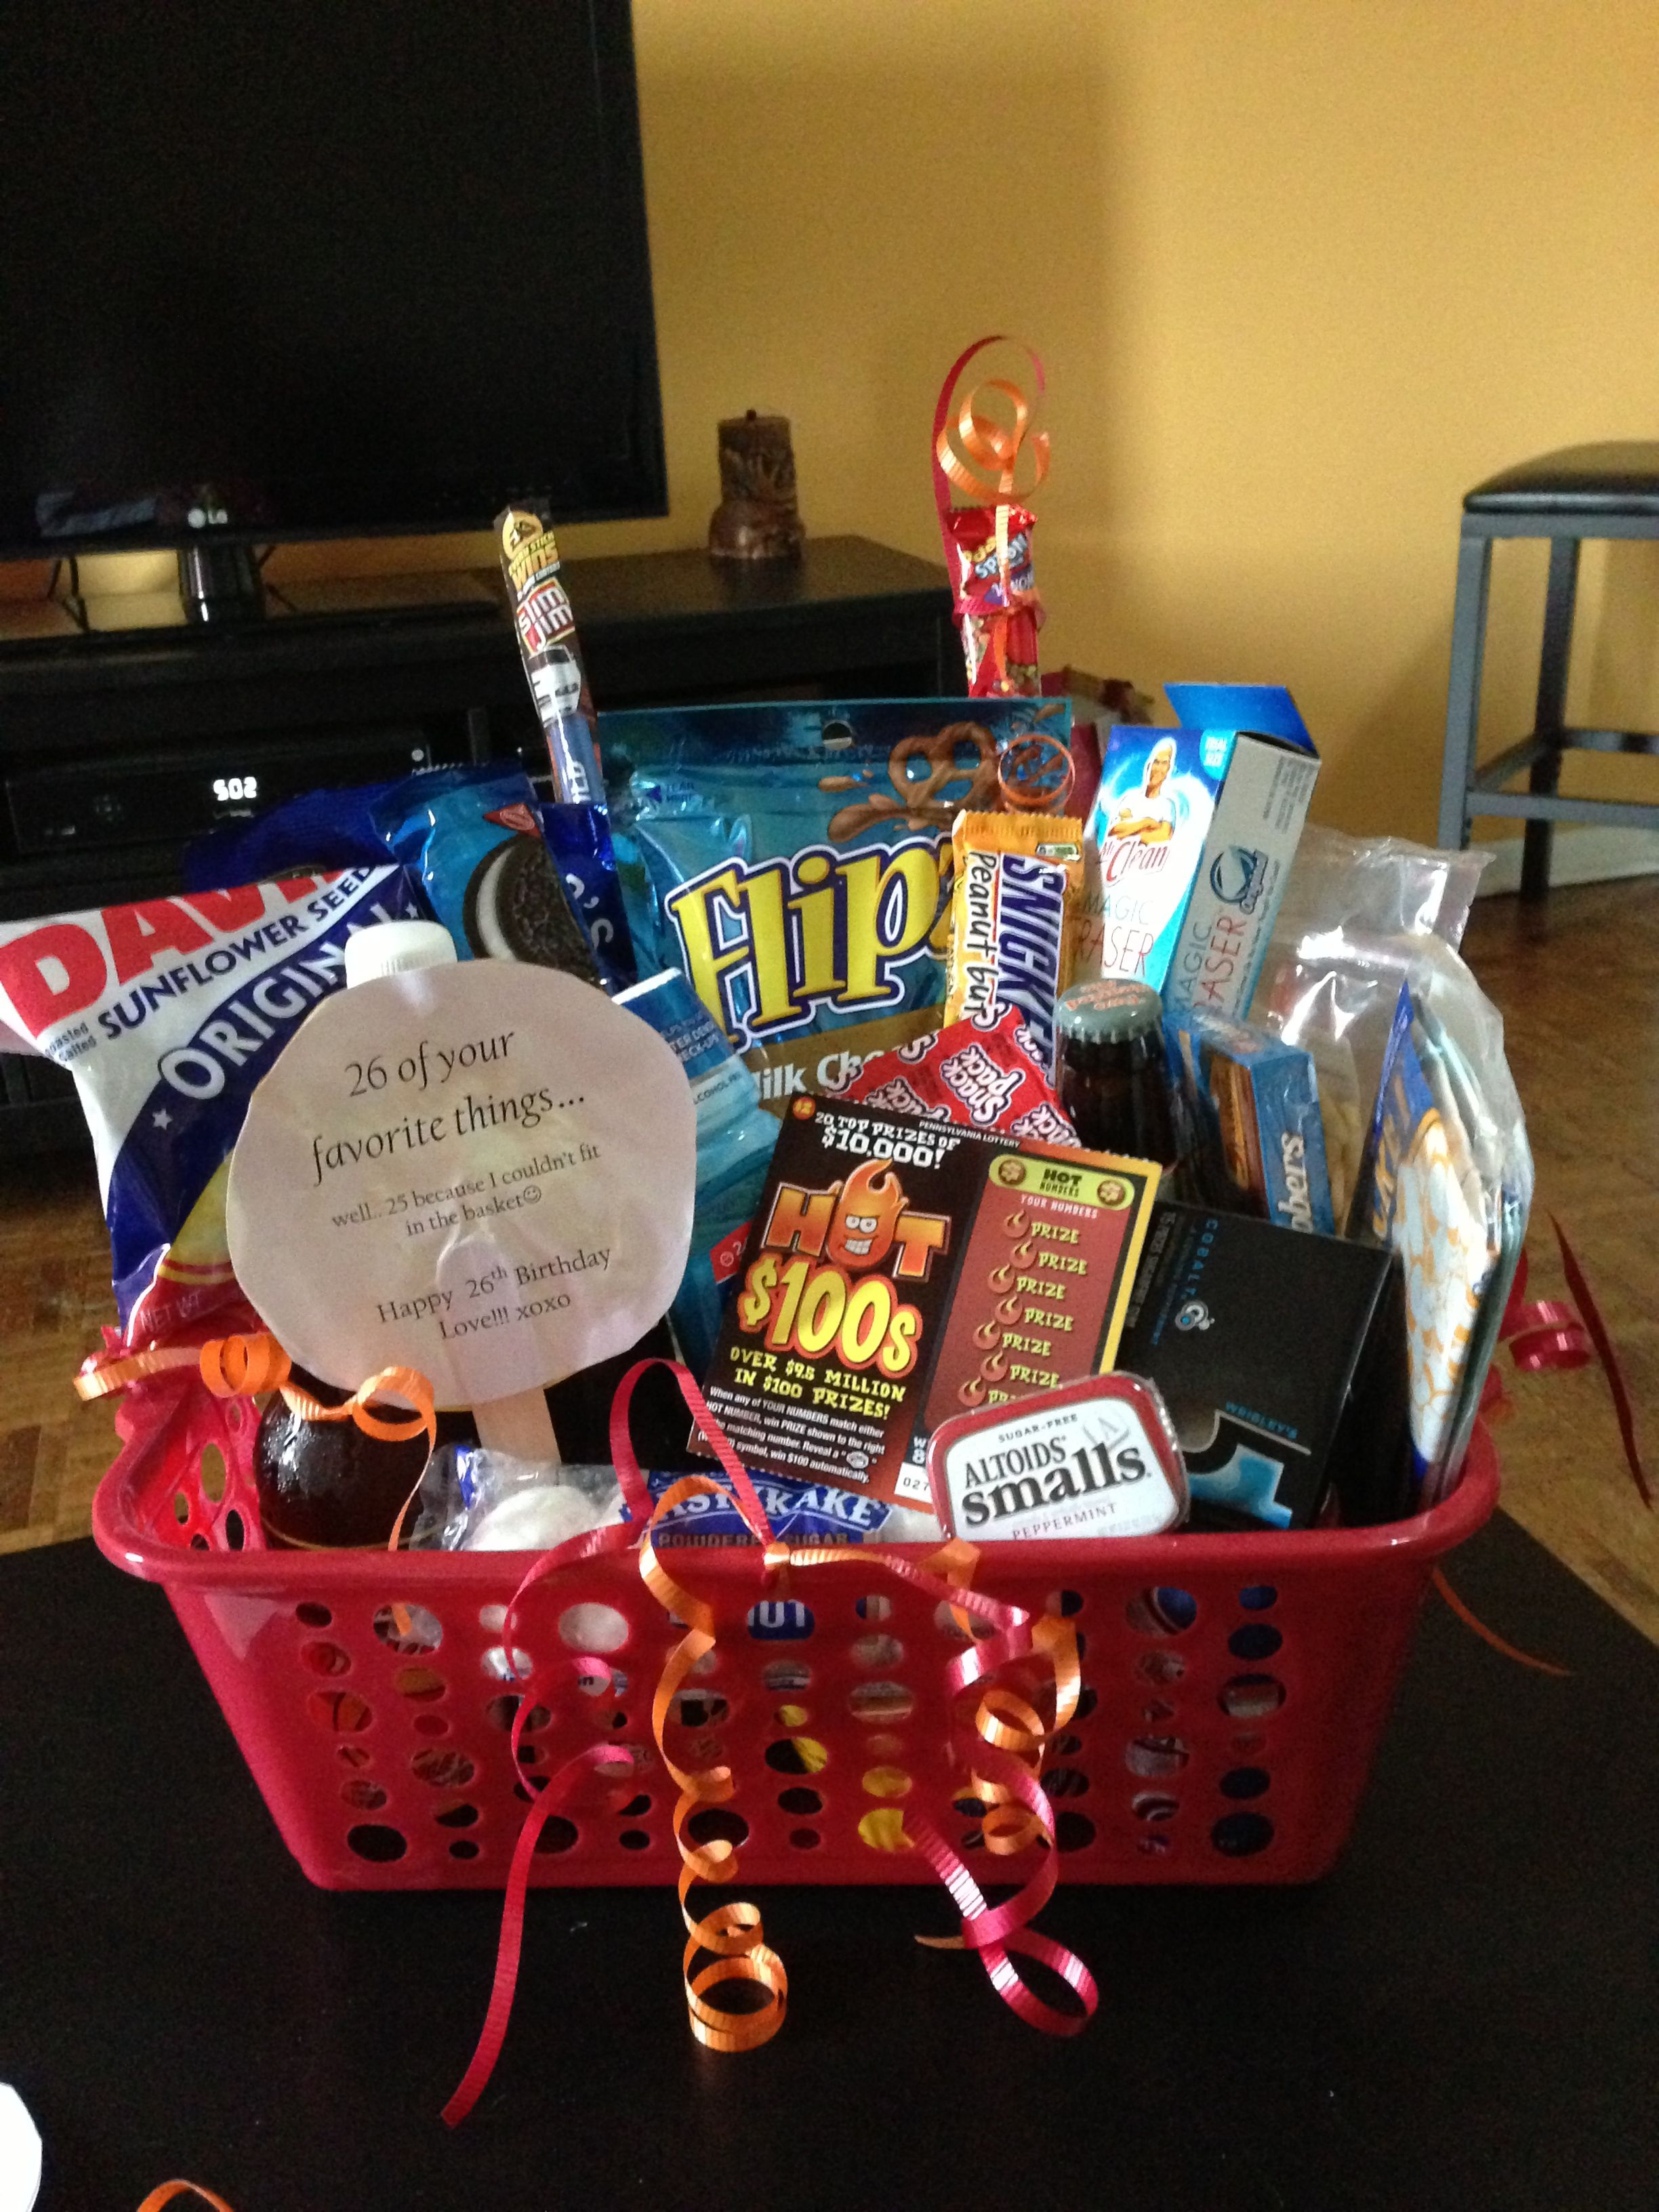 Boyfriend Birthday Basket 26 Of His Favorite Things For